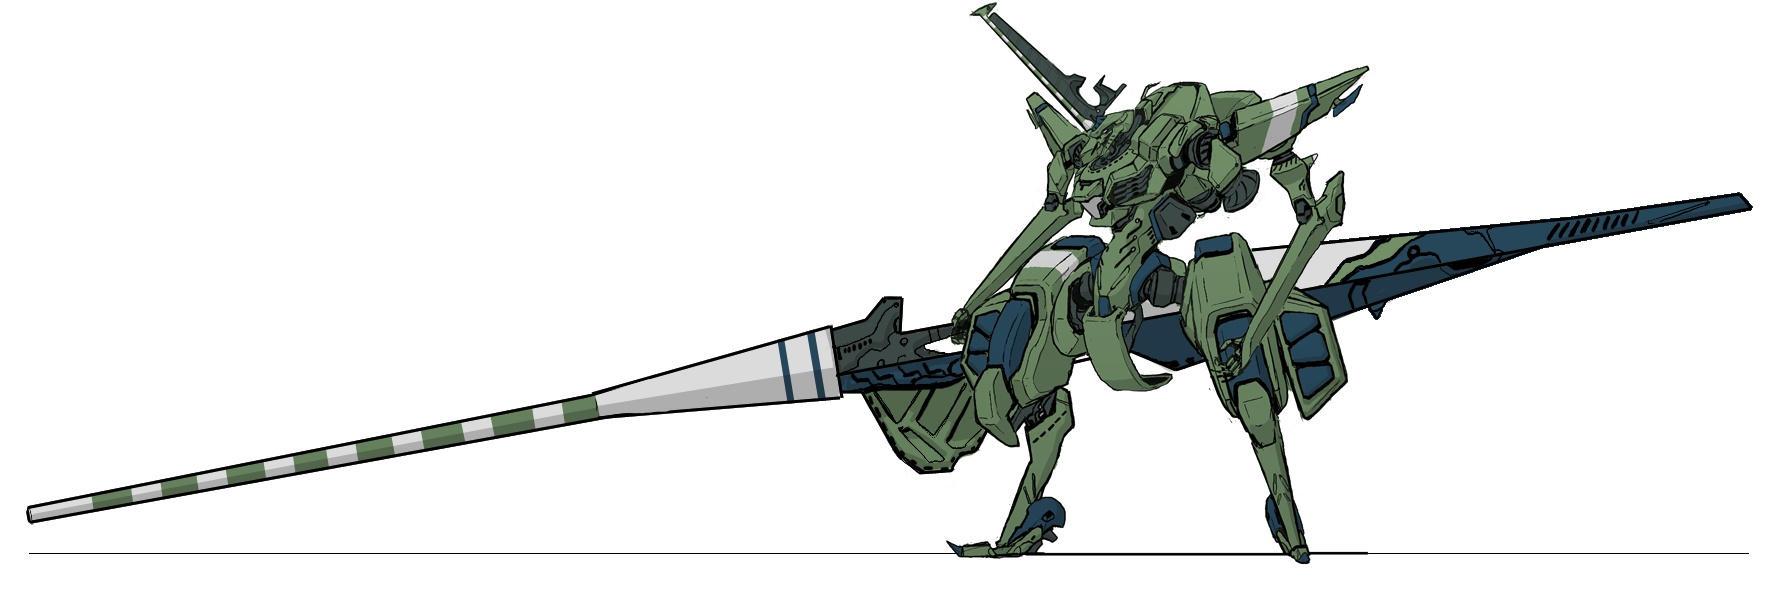 Galahad w. massdriver cannon by genocidalpenguin